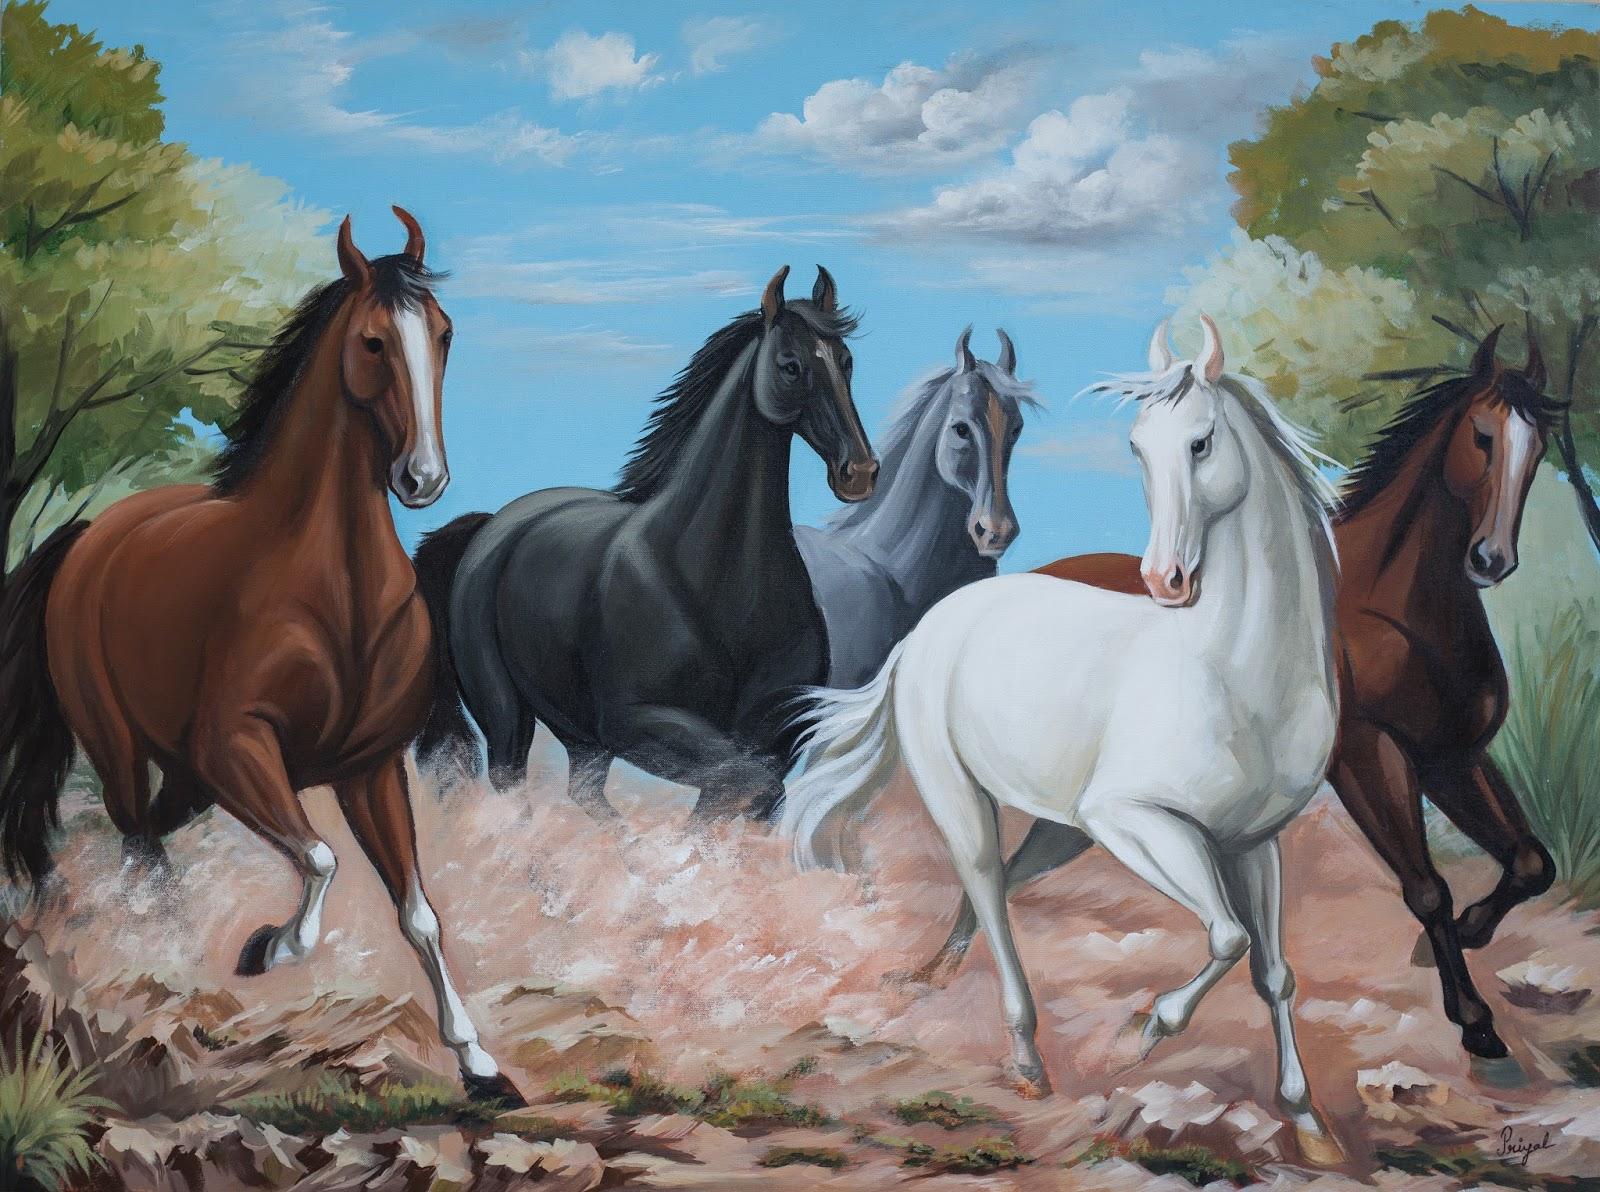 Running Horses Wall Art - Elitflat